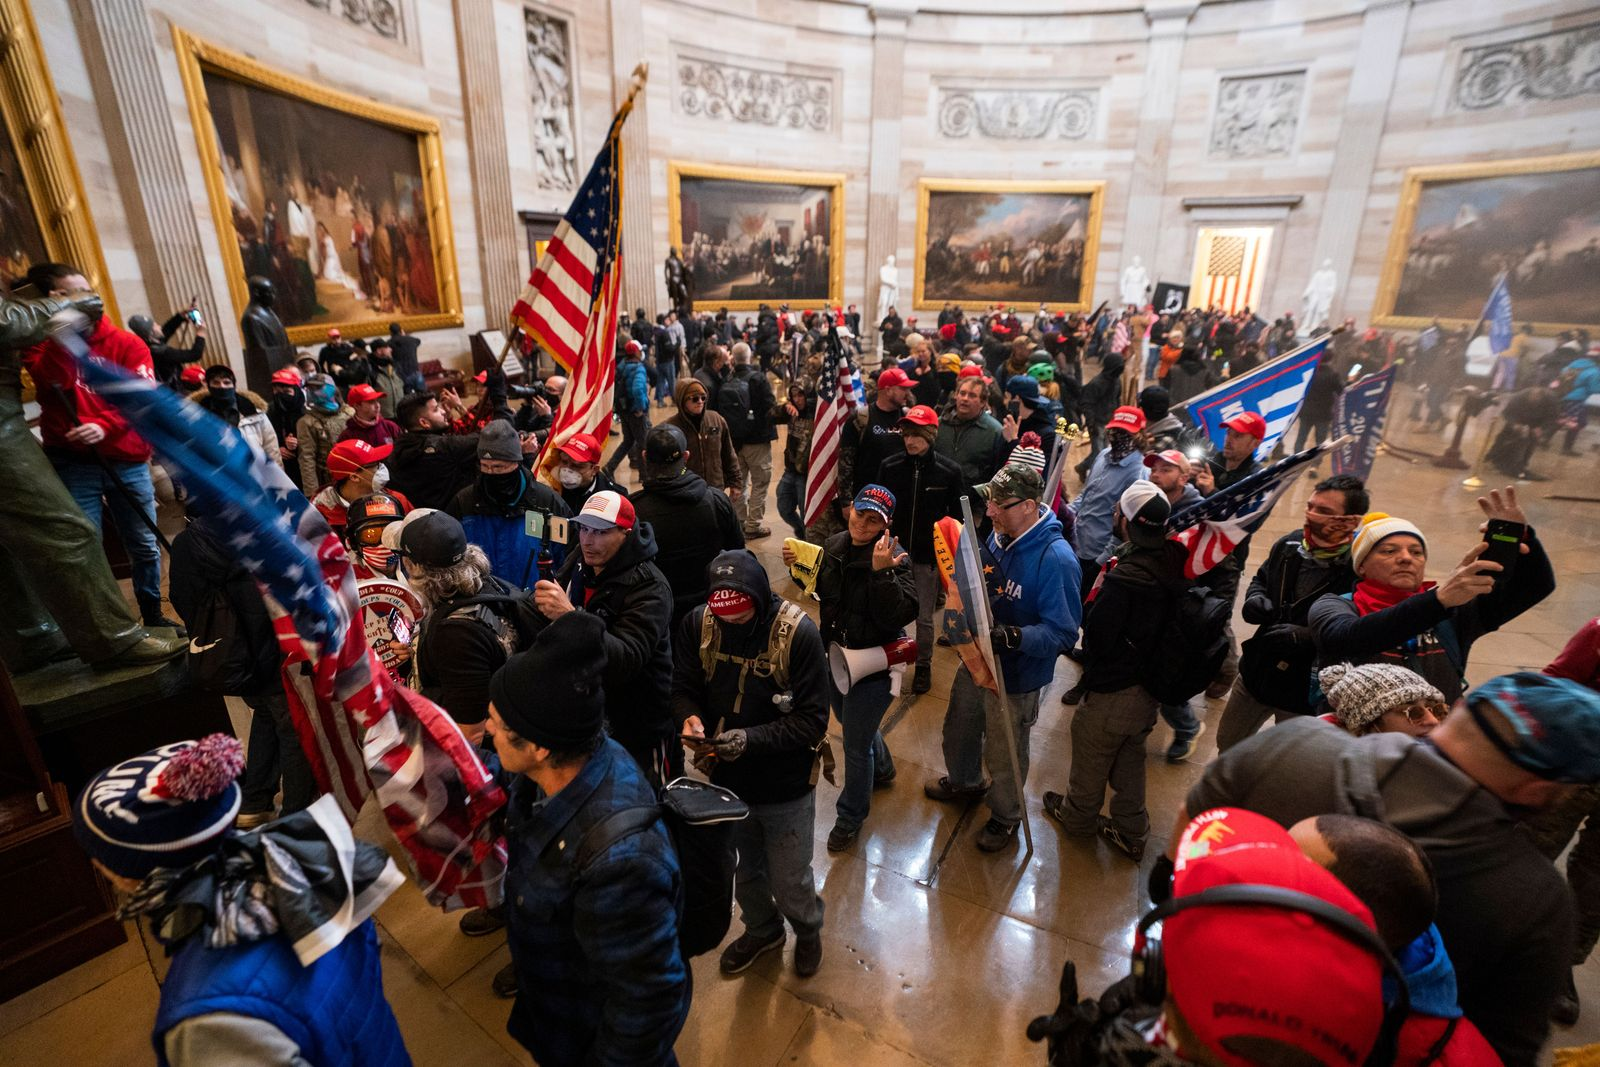 Protestors enter US Capitol, Washington, USA - 06 Jan 2021